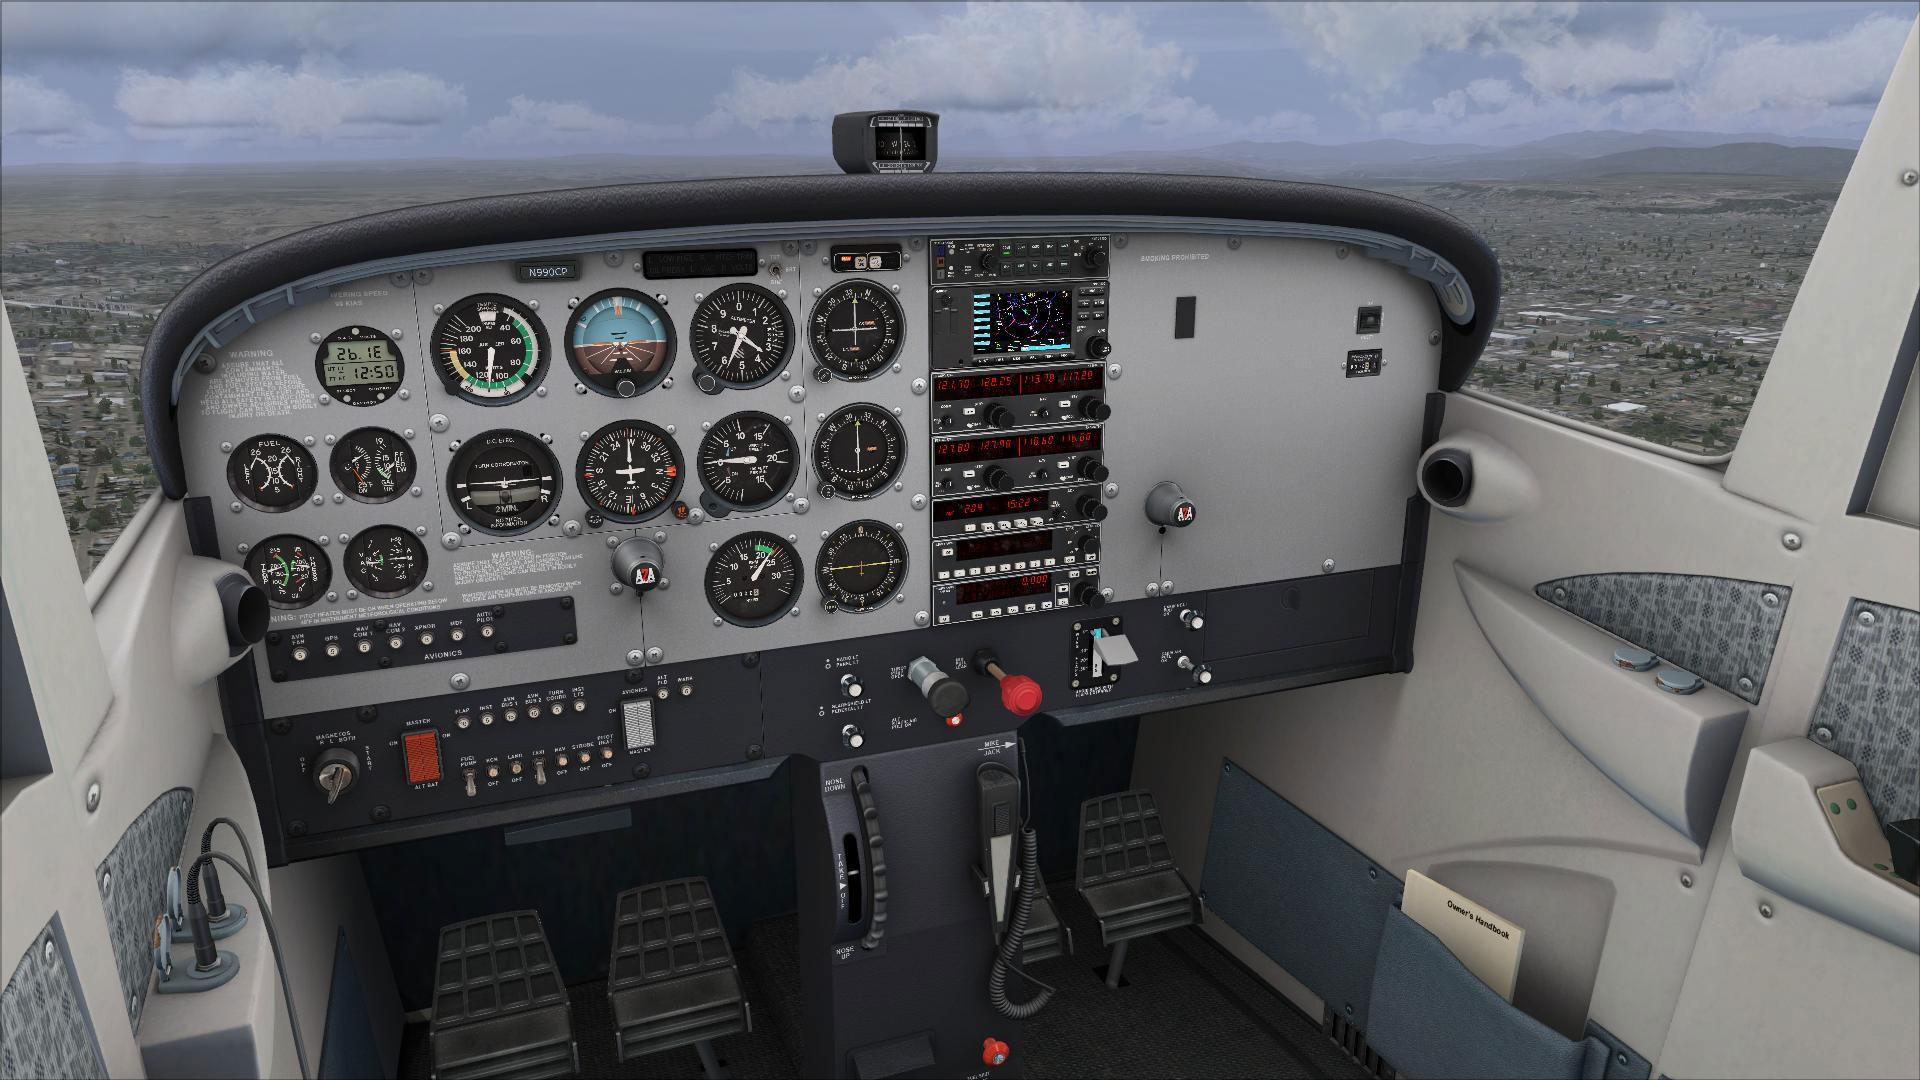 Cessna 172 trainer accu-sim for fsx/p3d by a2a simulations.